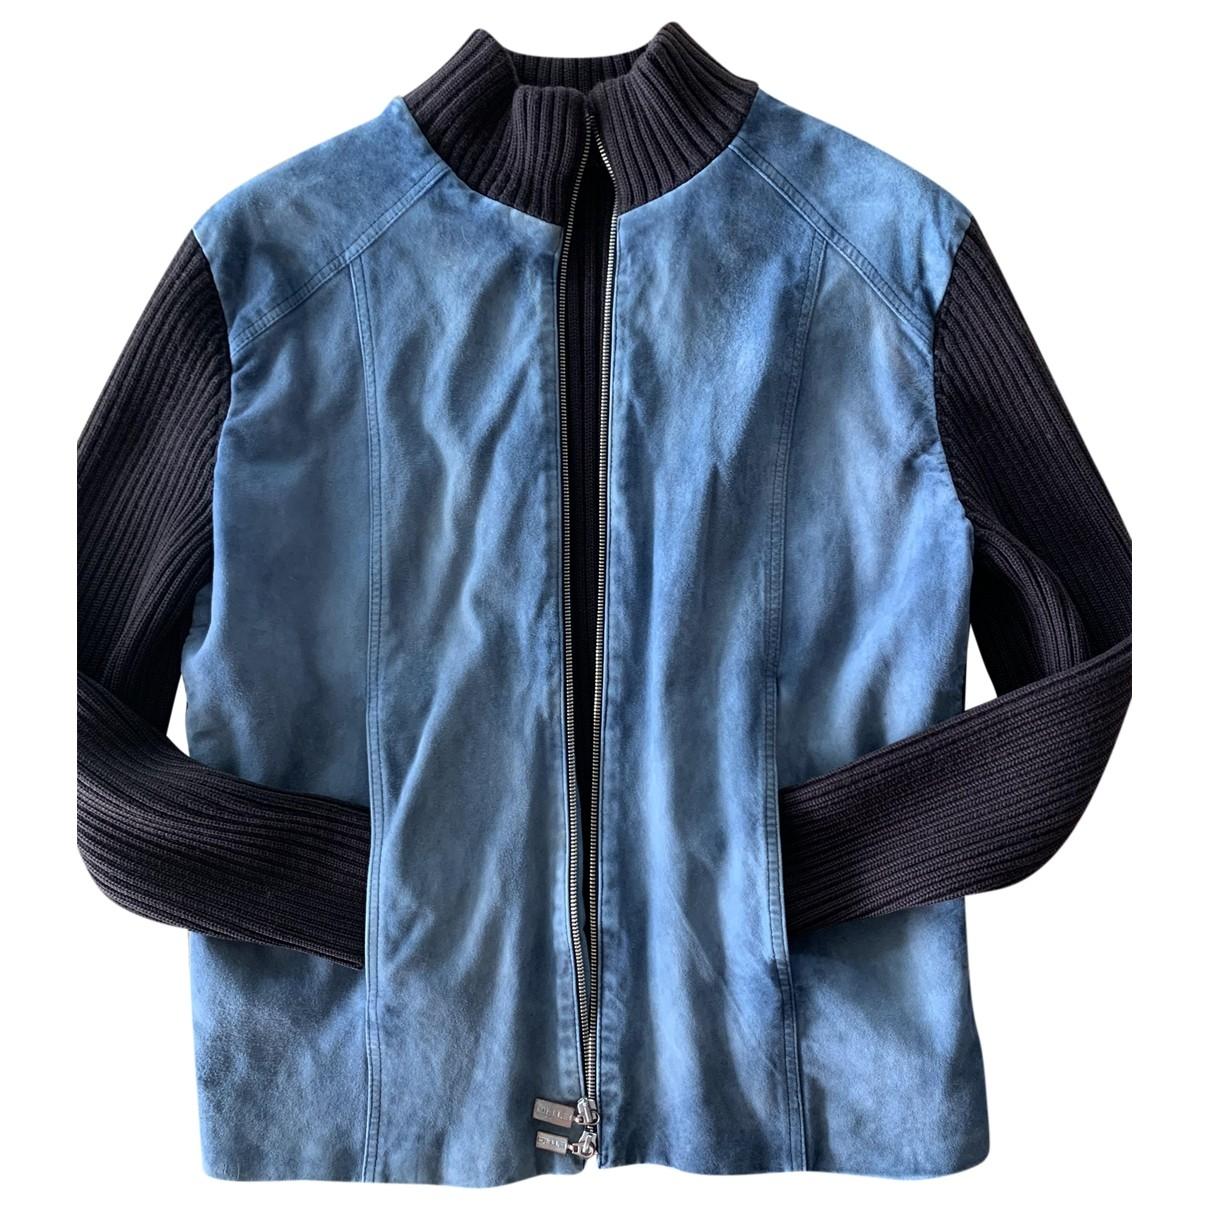 Etro \N Jacke in  Blau Wolle